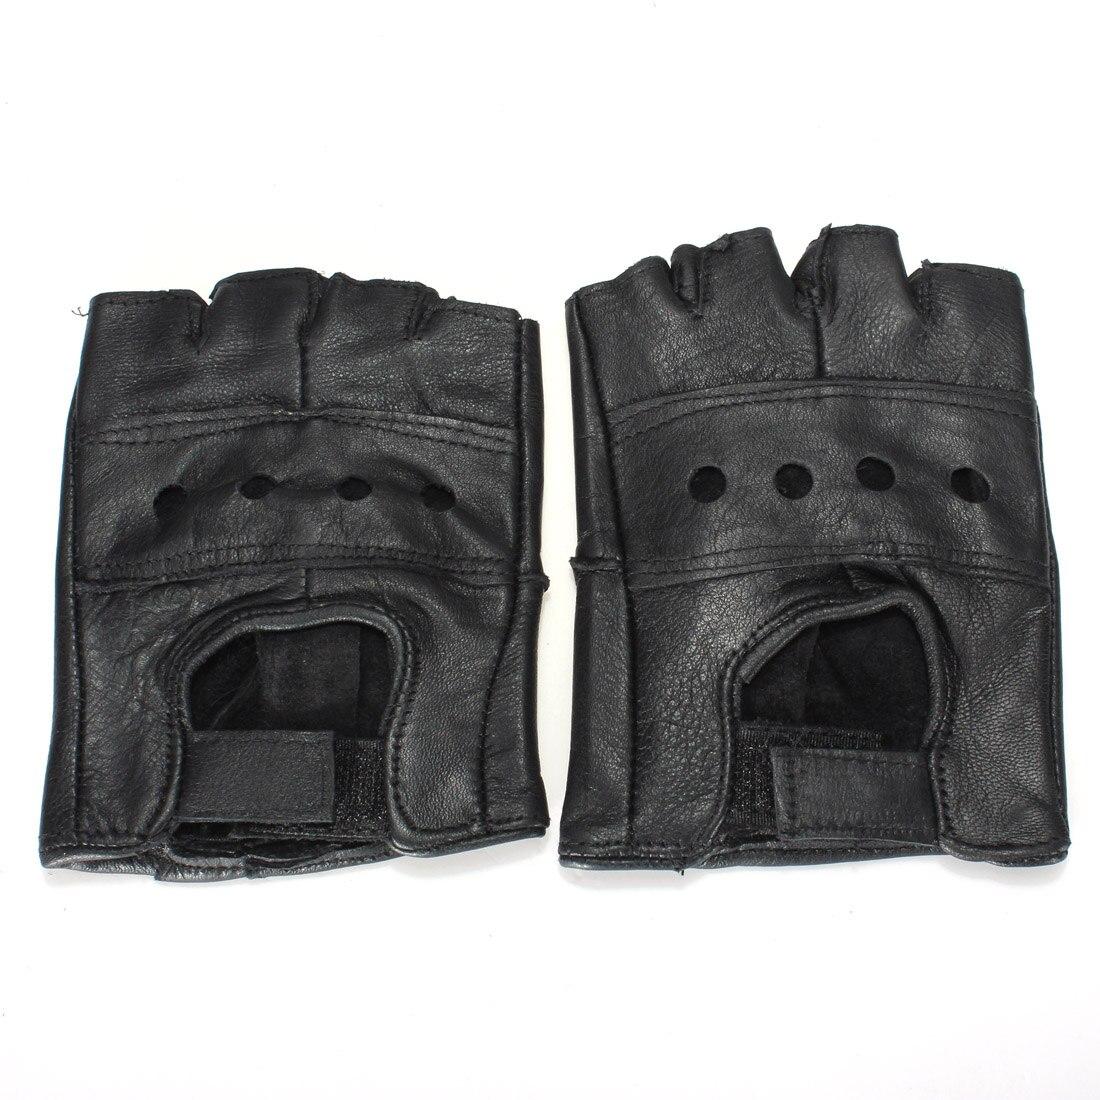 2 stücke M Schwarz Medium Fingerlose Leder Motorrad Handschuh Entlüftet Rindsleder Multi-verwenden Halb Finger Leder